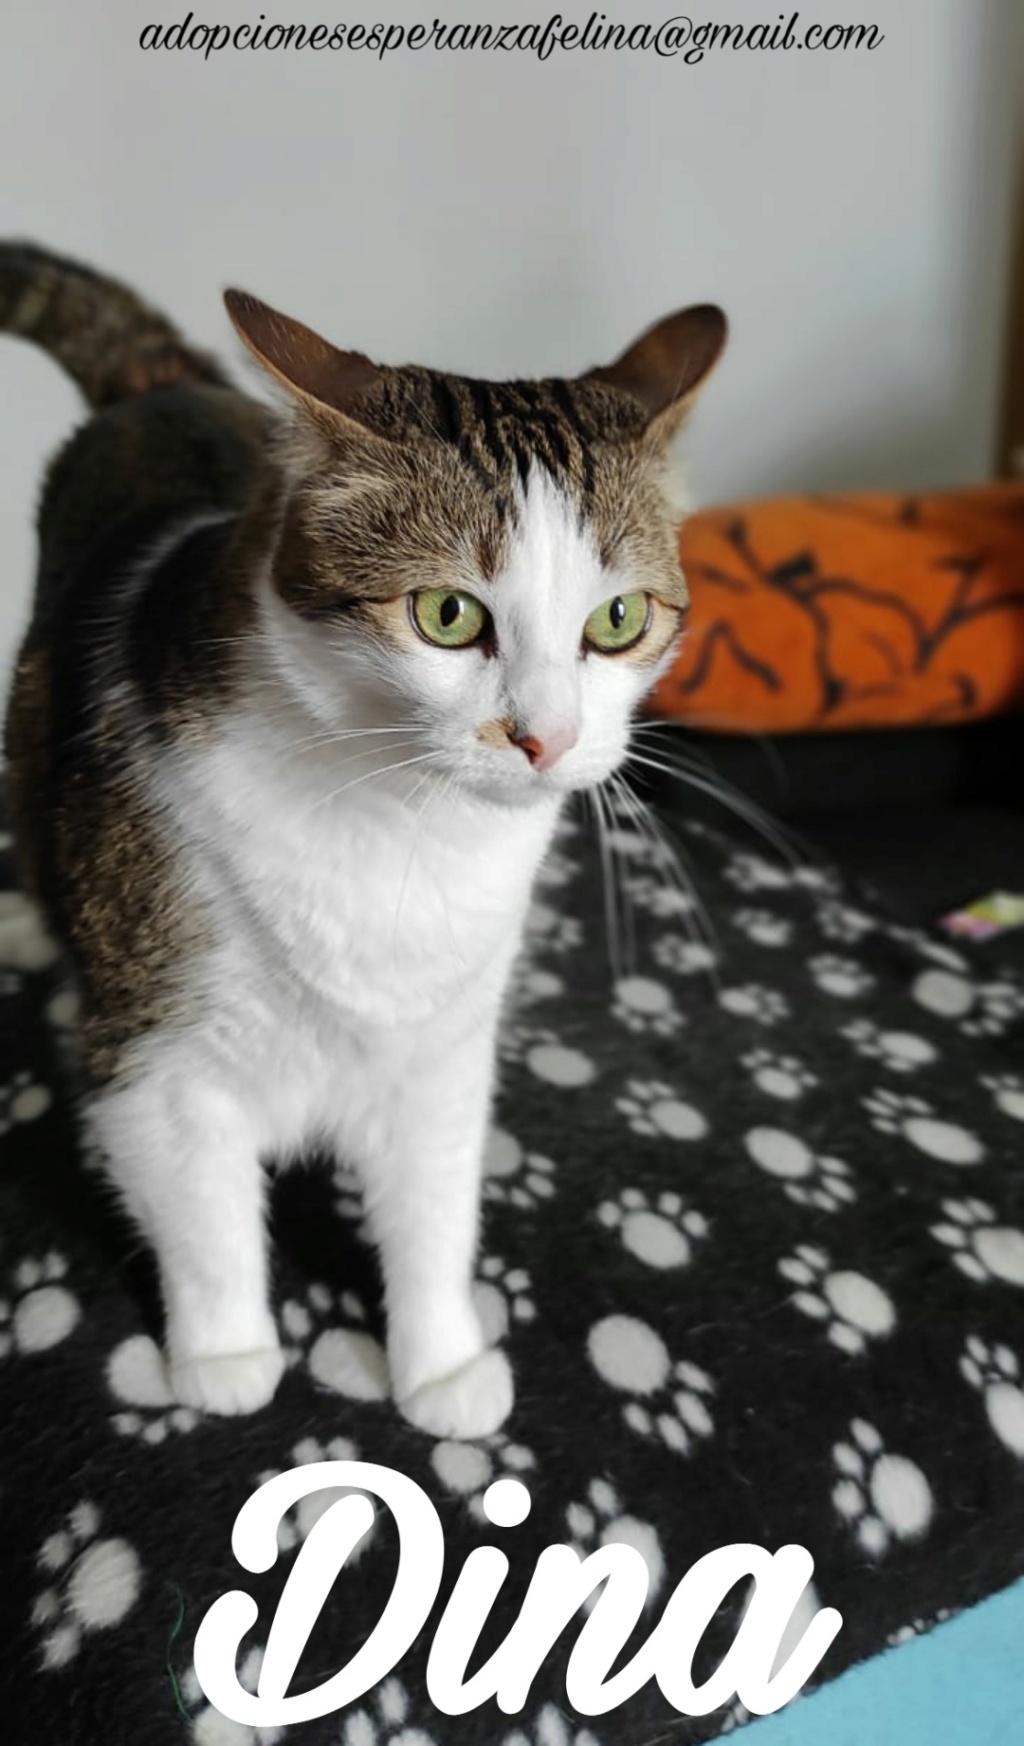 Dina, preciosa gata busca su hogar (Álava, fecha de nacimiento aproximada 10/04/2014 ) - Página 2 Picsar40